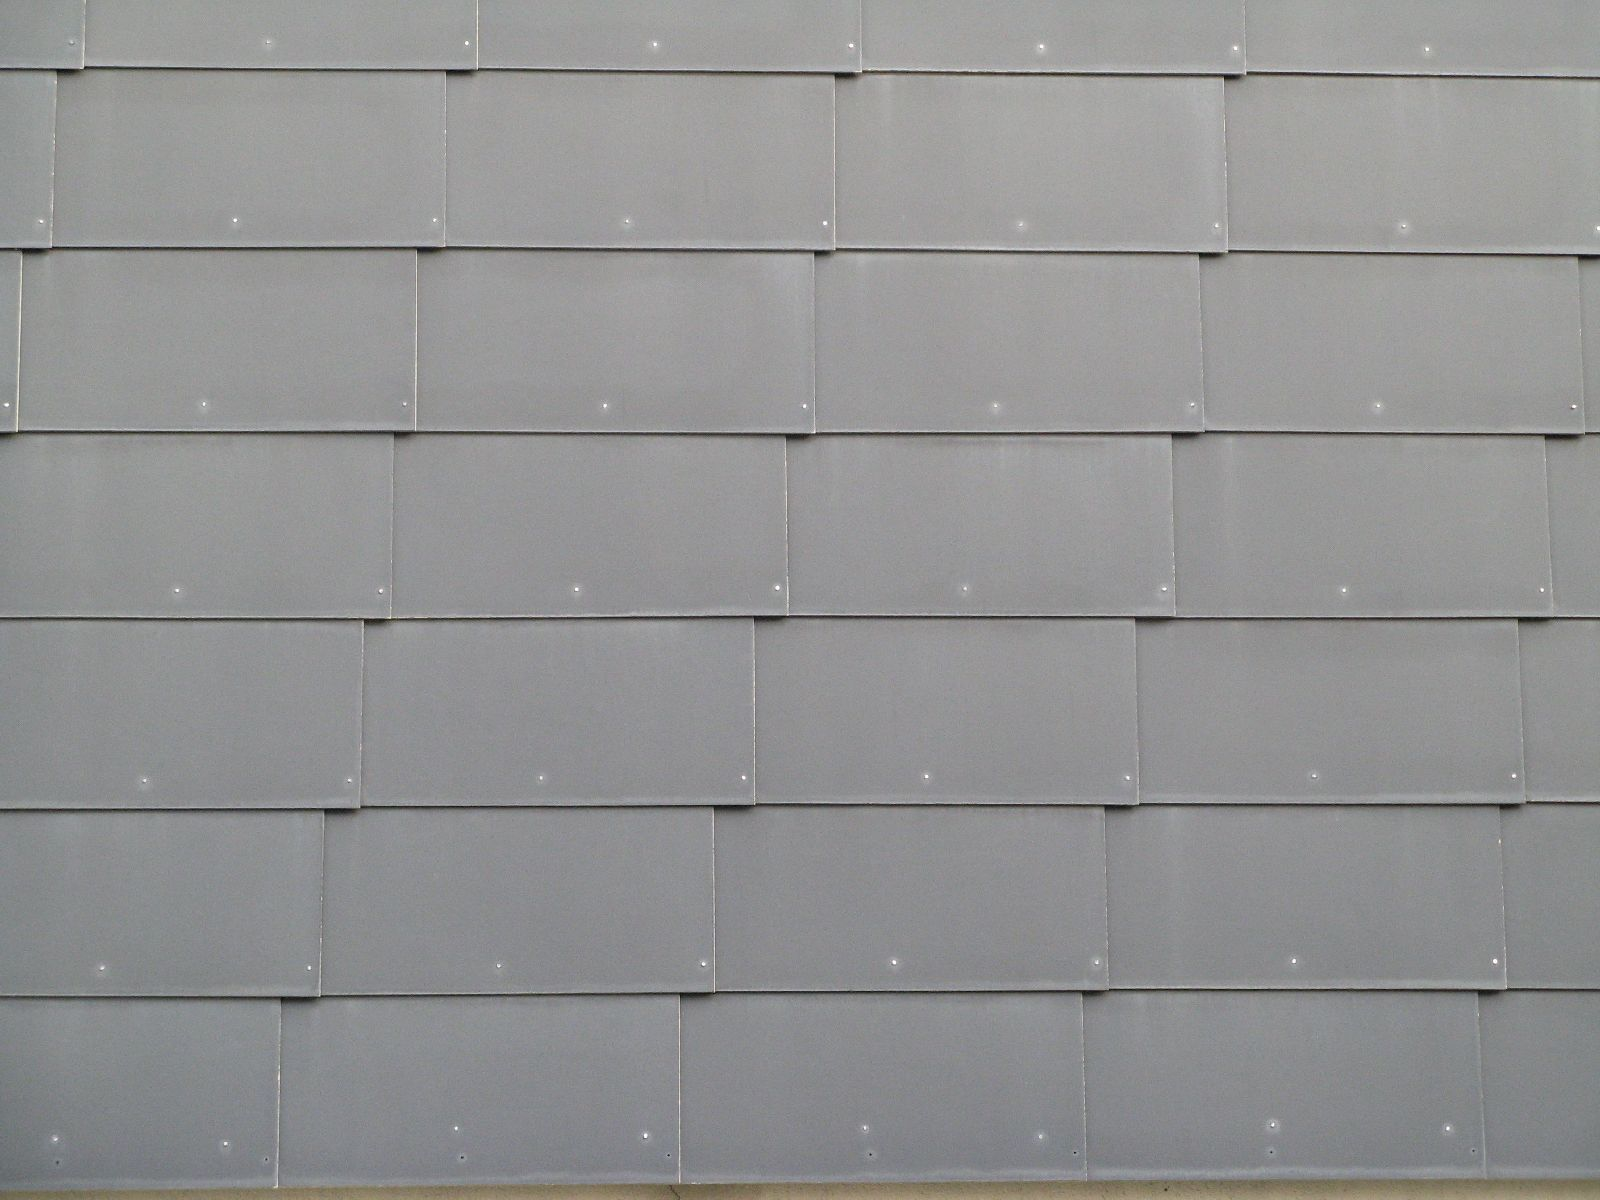 Brick_Texture_B_01588